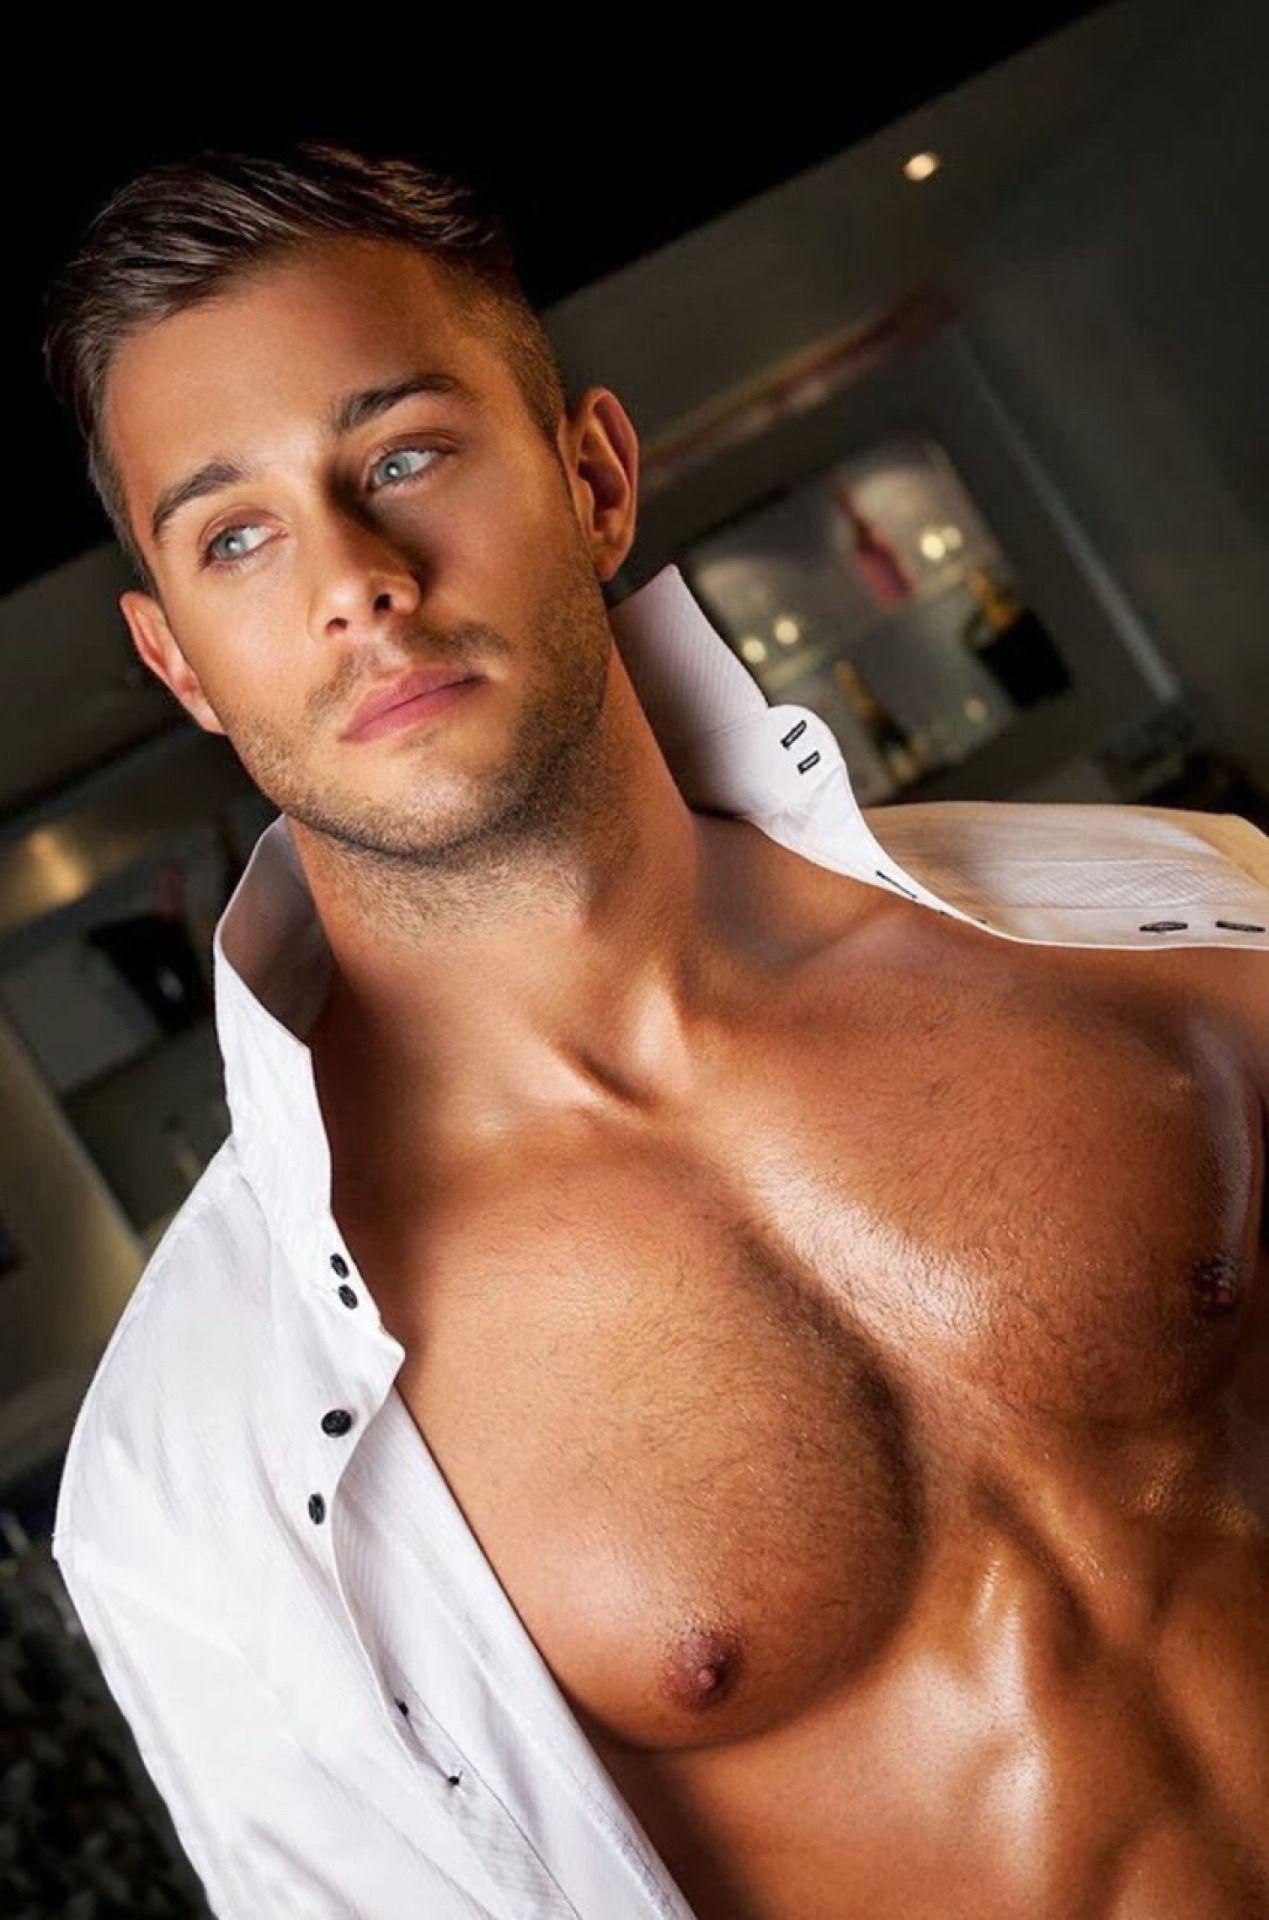 Straight Guy For Gay Eyes